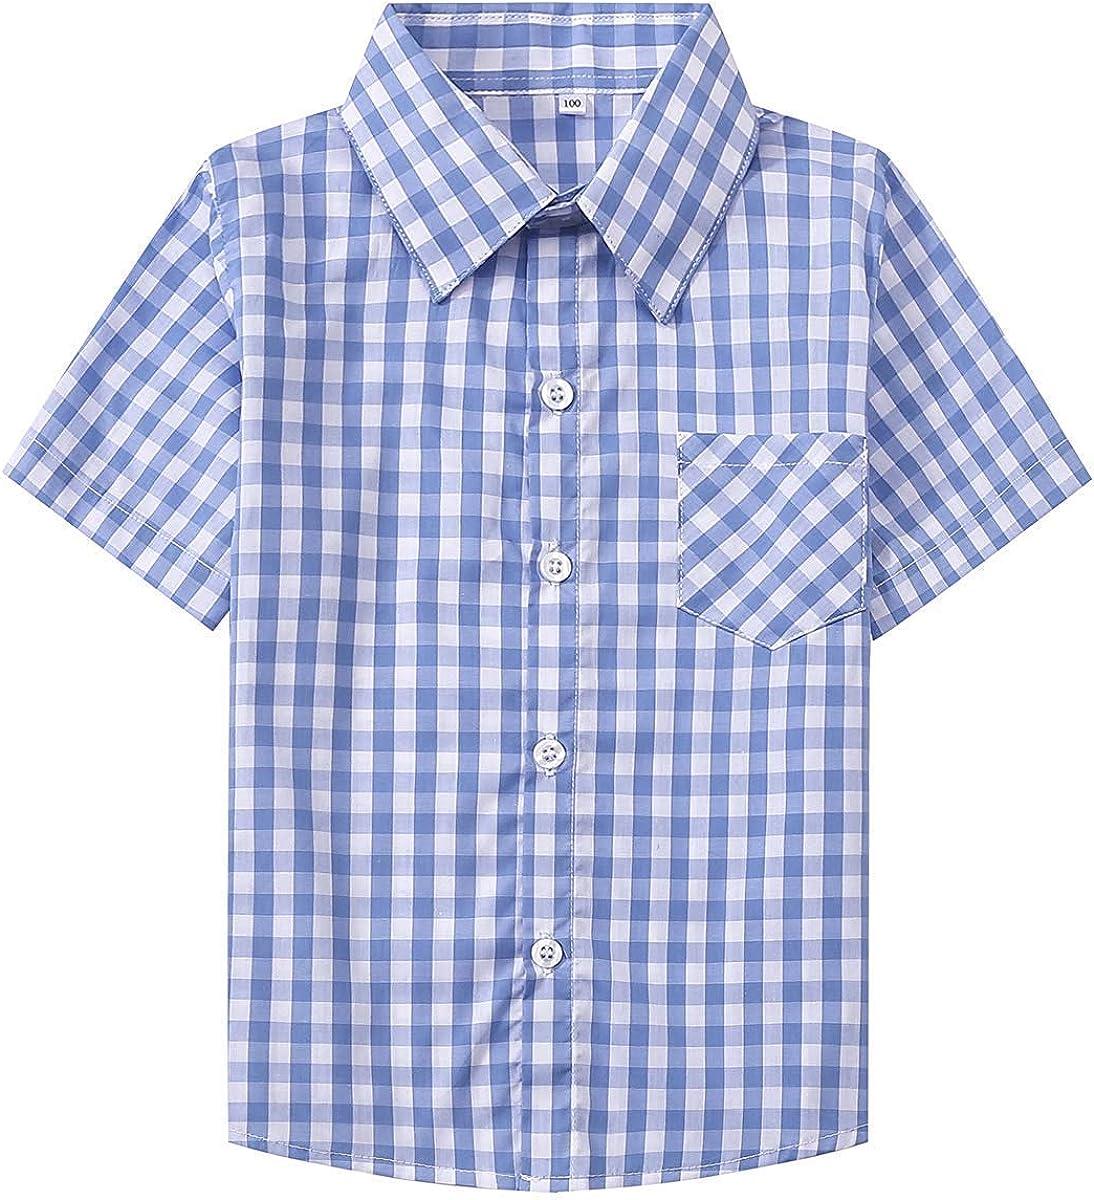 SANGTREE Boys Girls & Adult Short Sleeve Plaid Shirt, 2 Years - 2XL